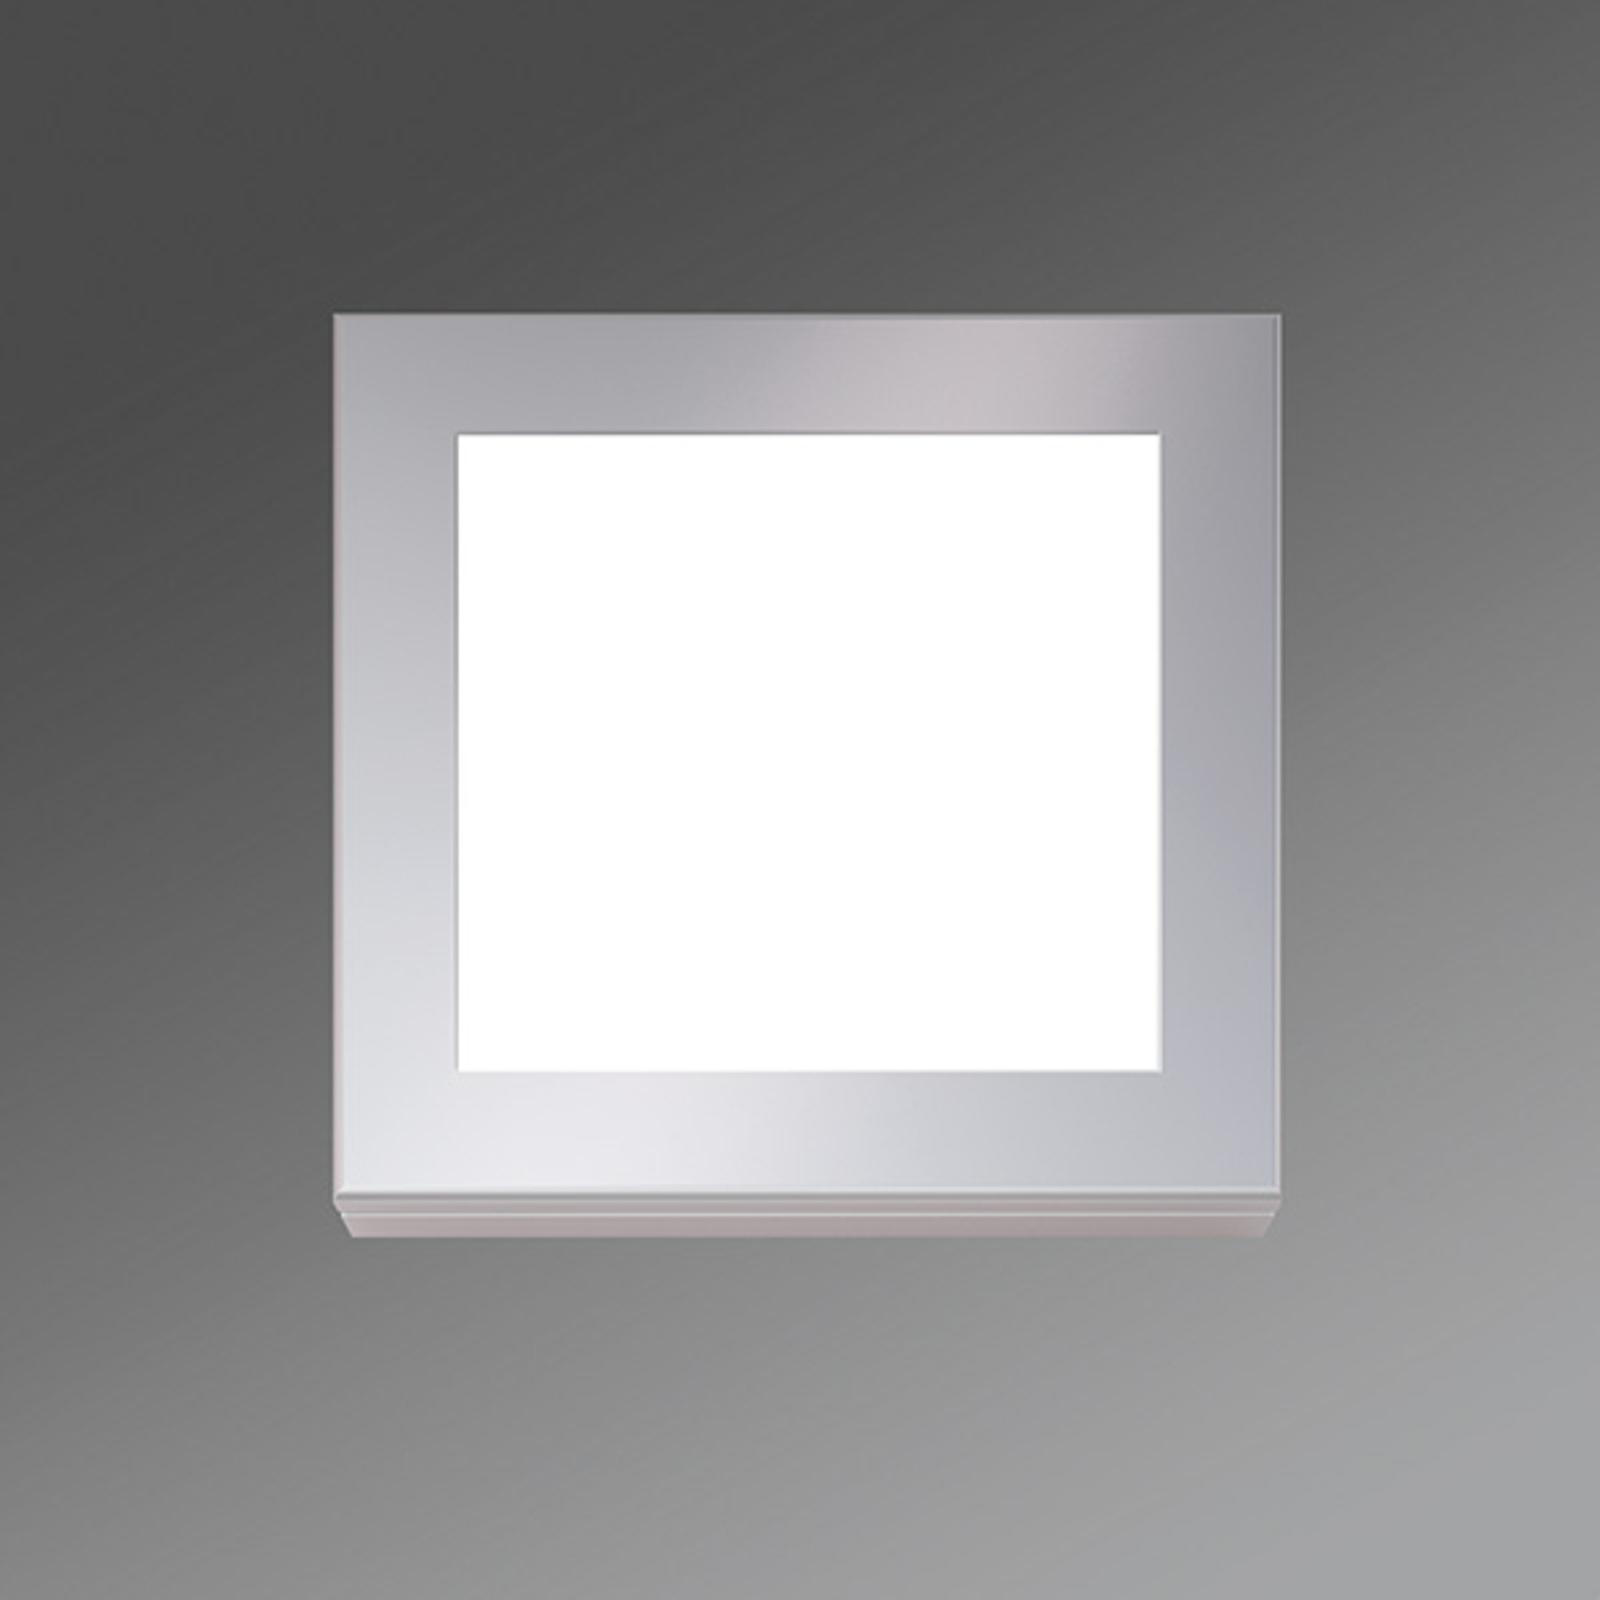 Rektangulær LED-vegglampe Visula-VSWIG 12 W